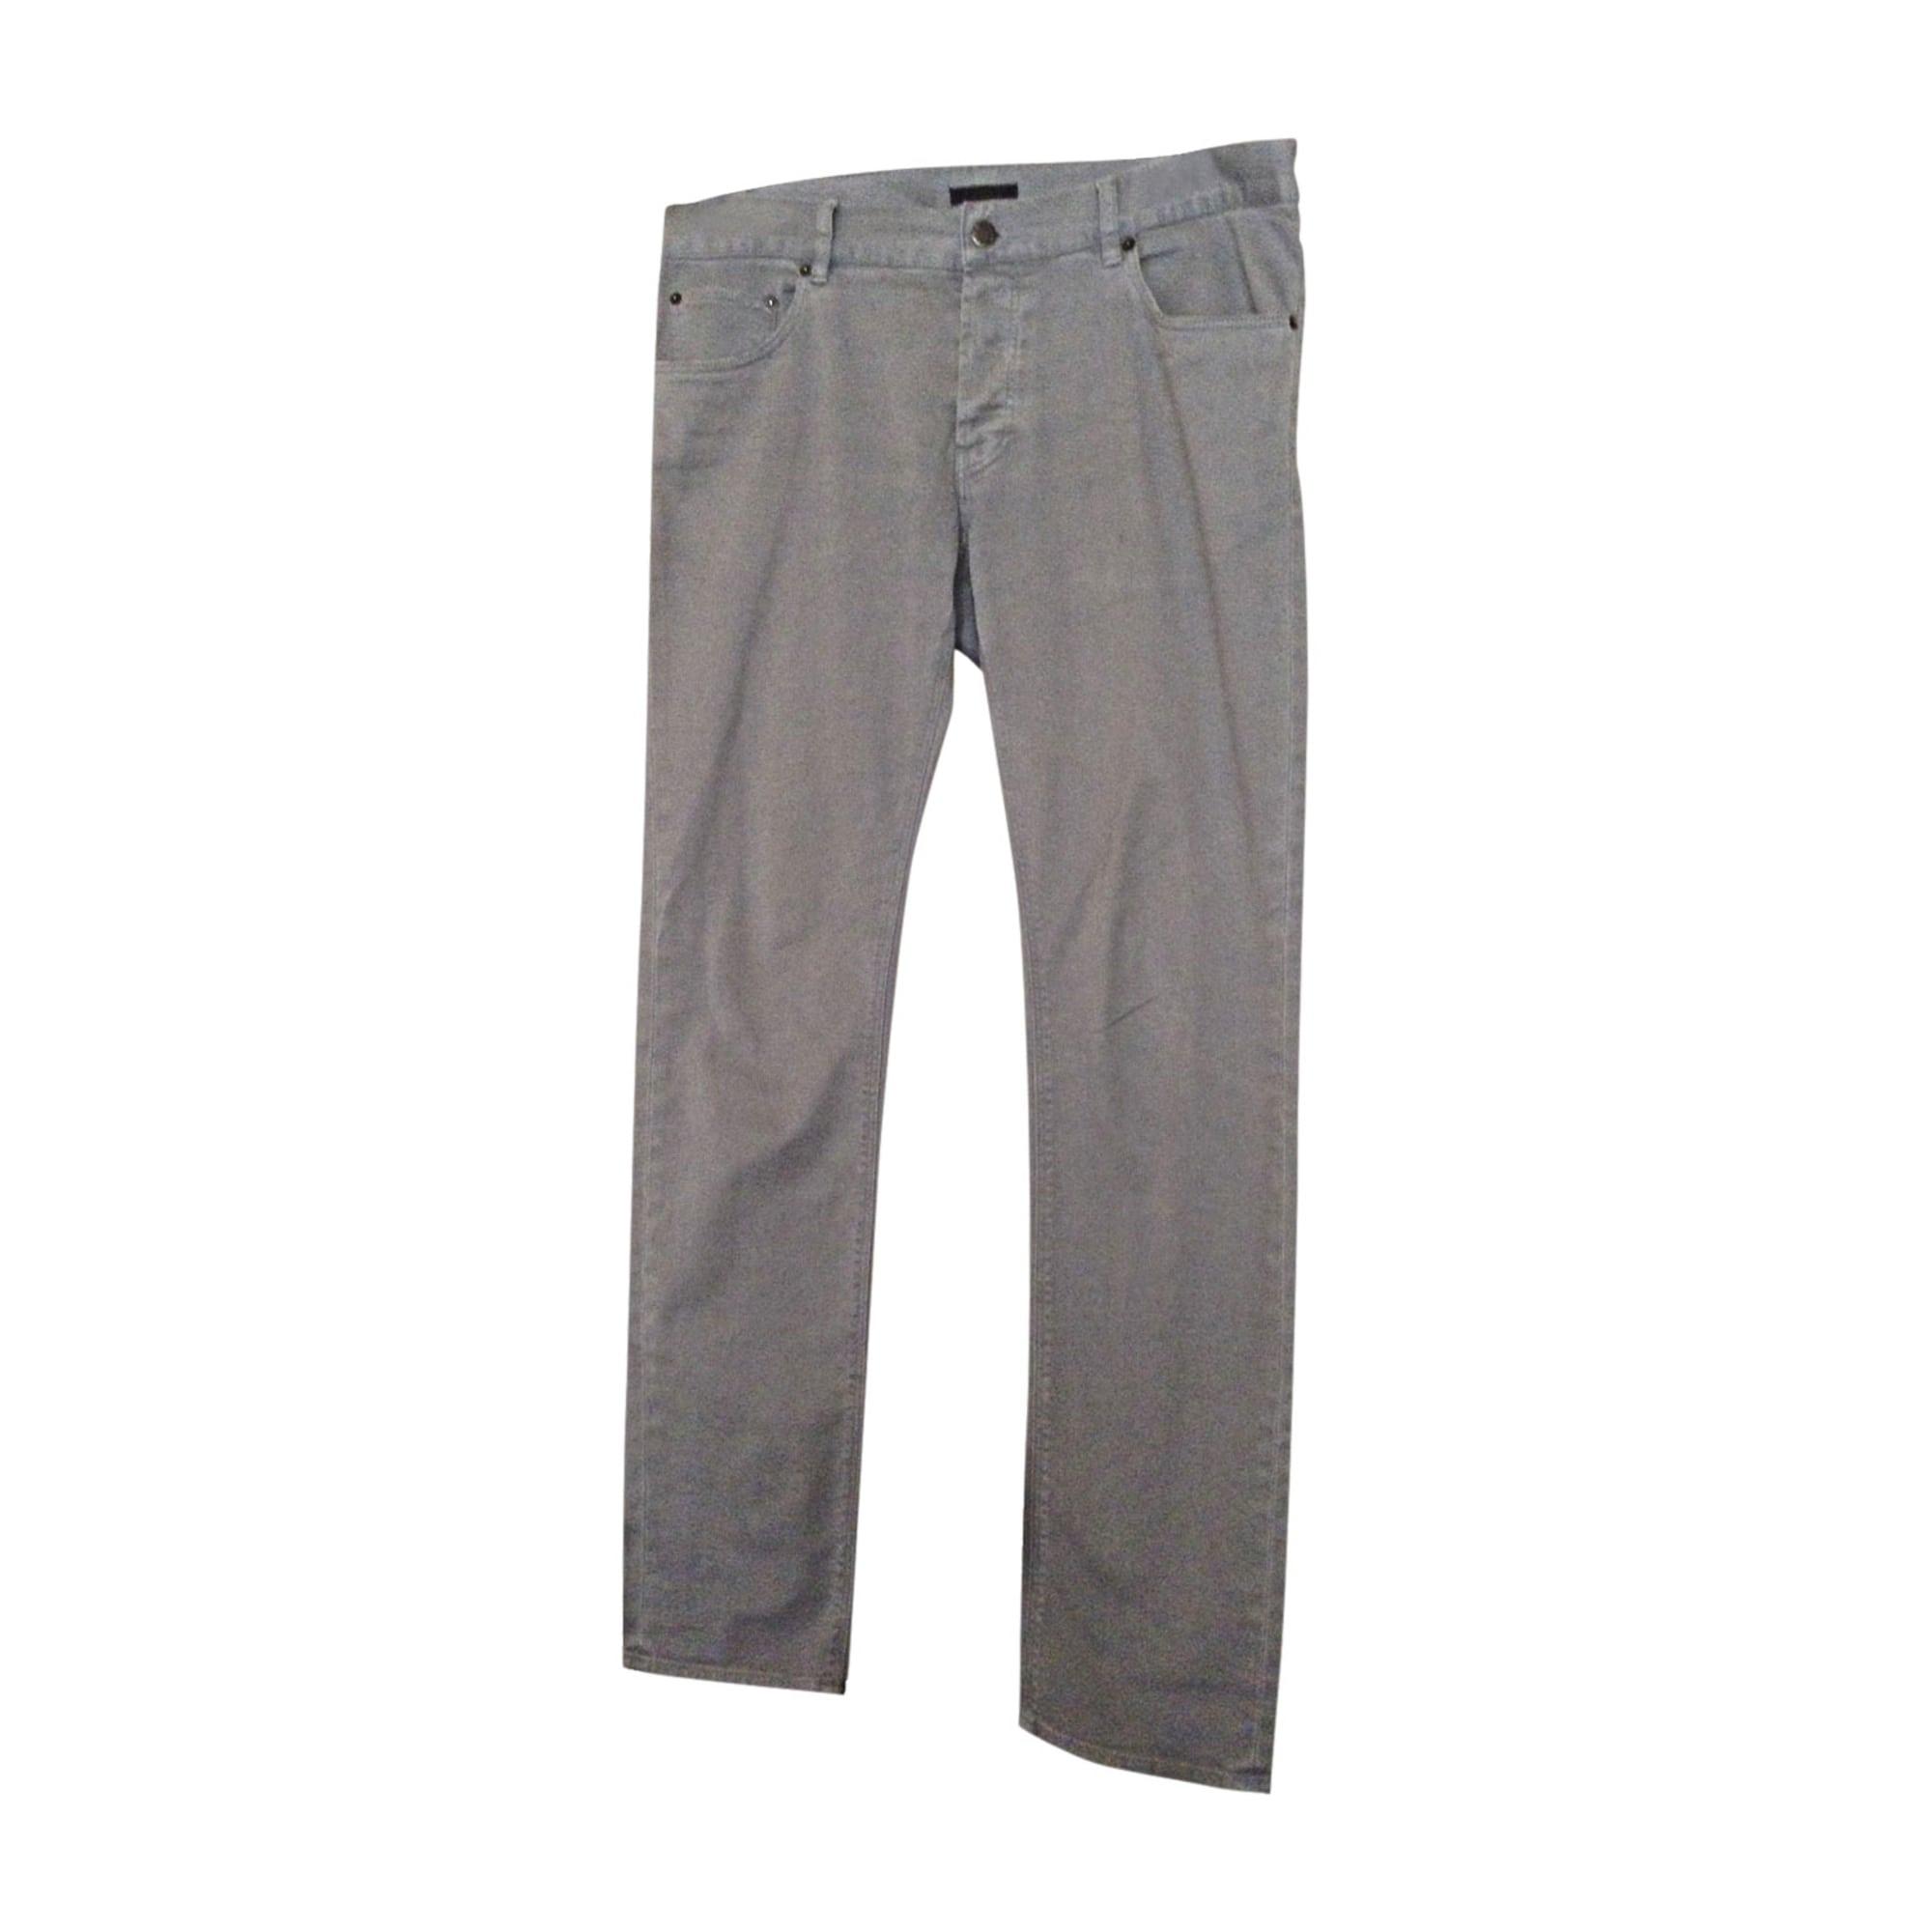 Jeans droit PRADA Gris, anthracite